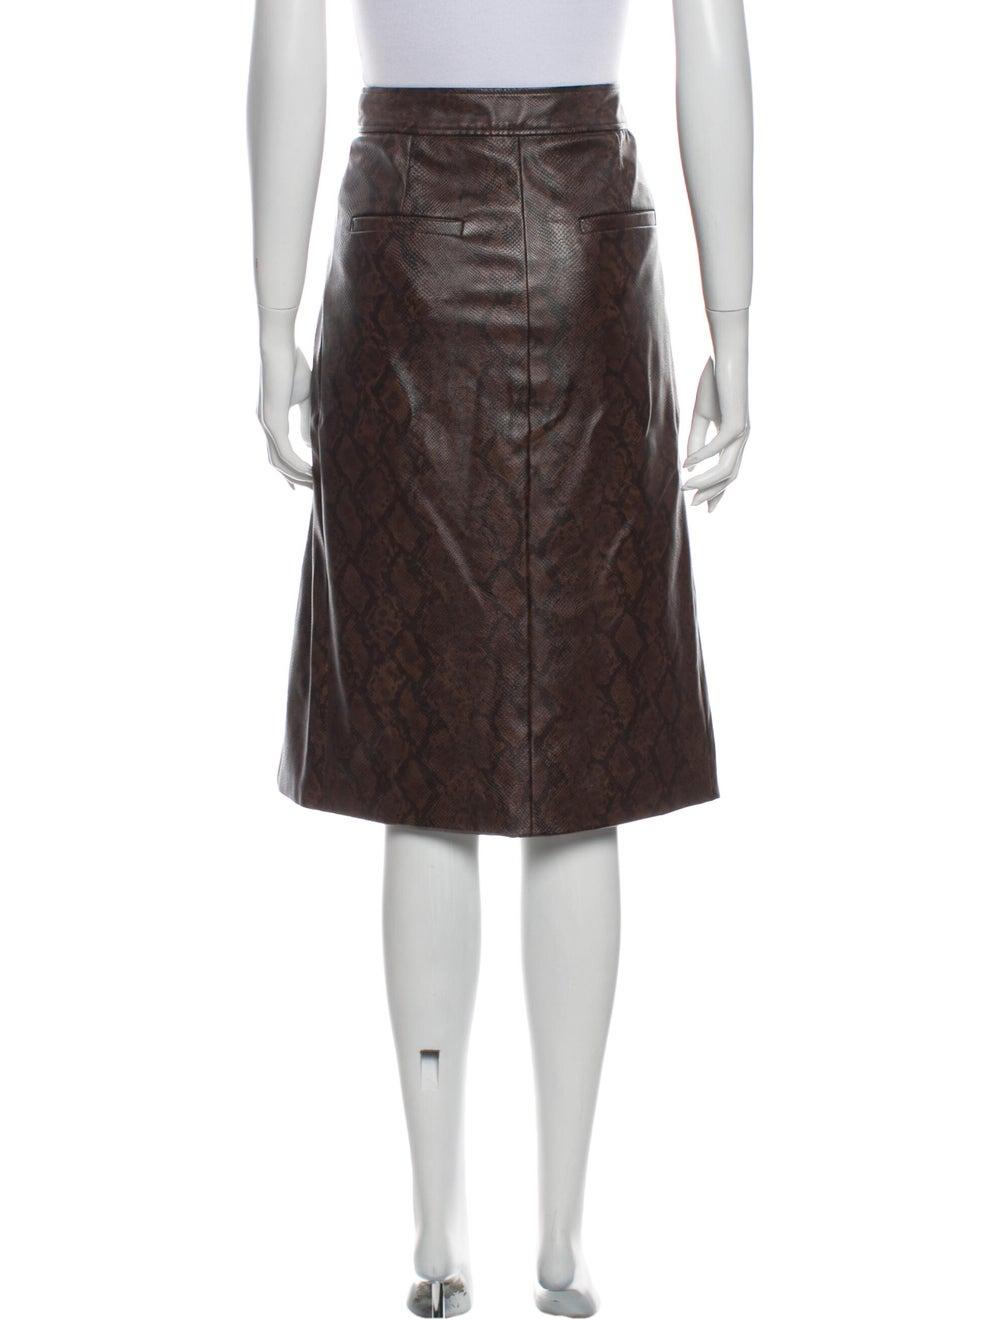 Tibi Knee-Length Skirt Brown - image 3